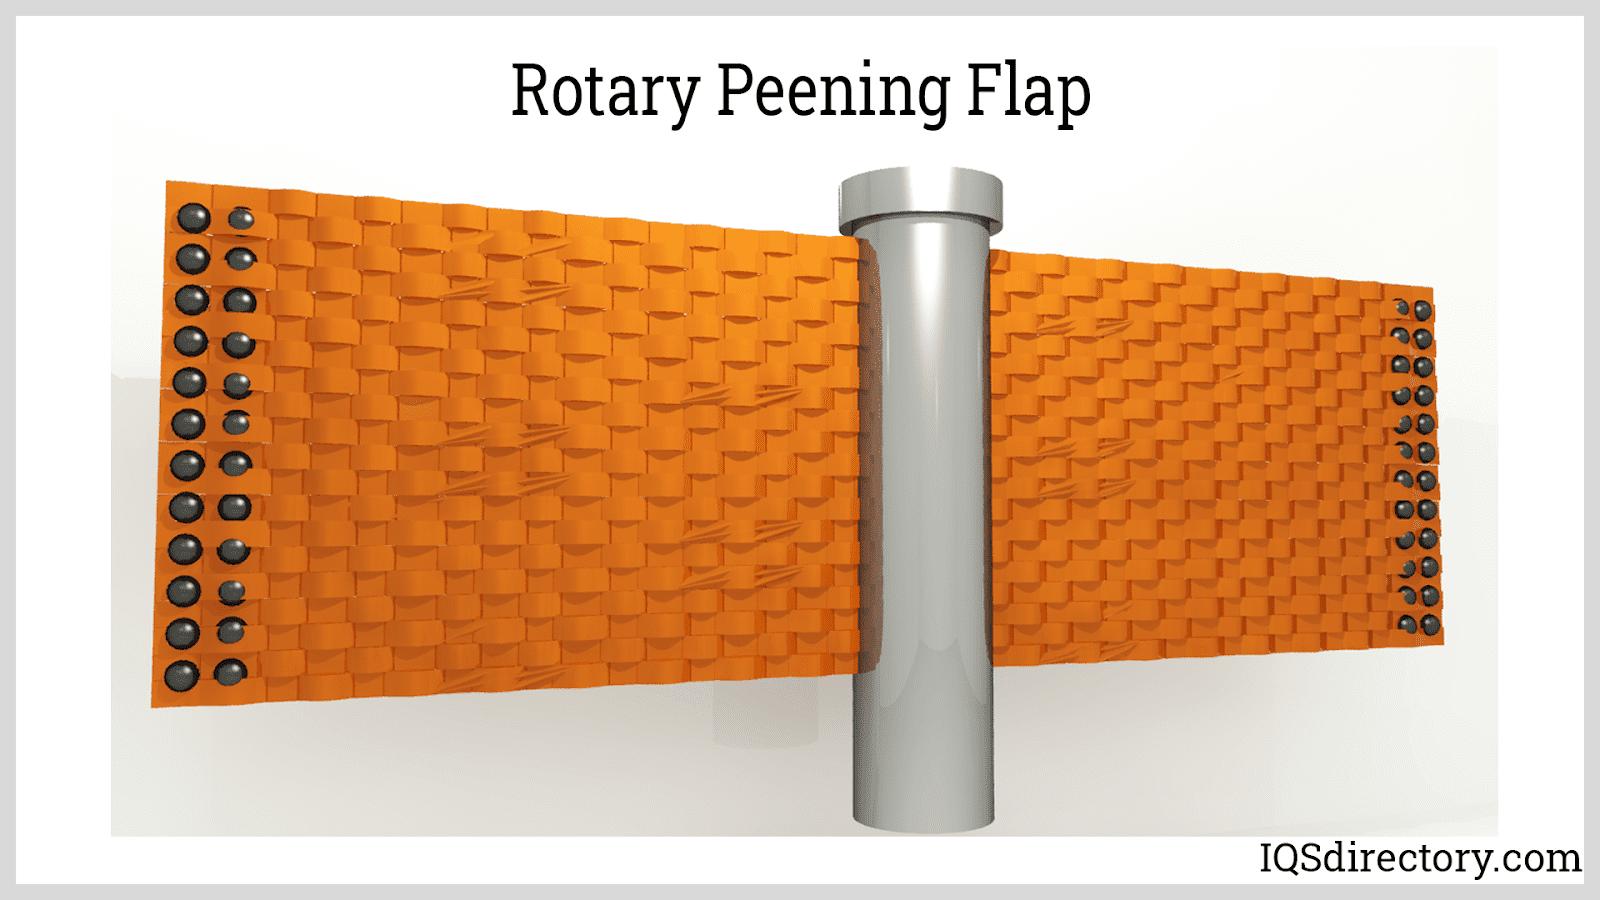 Rotary Peening Flap